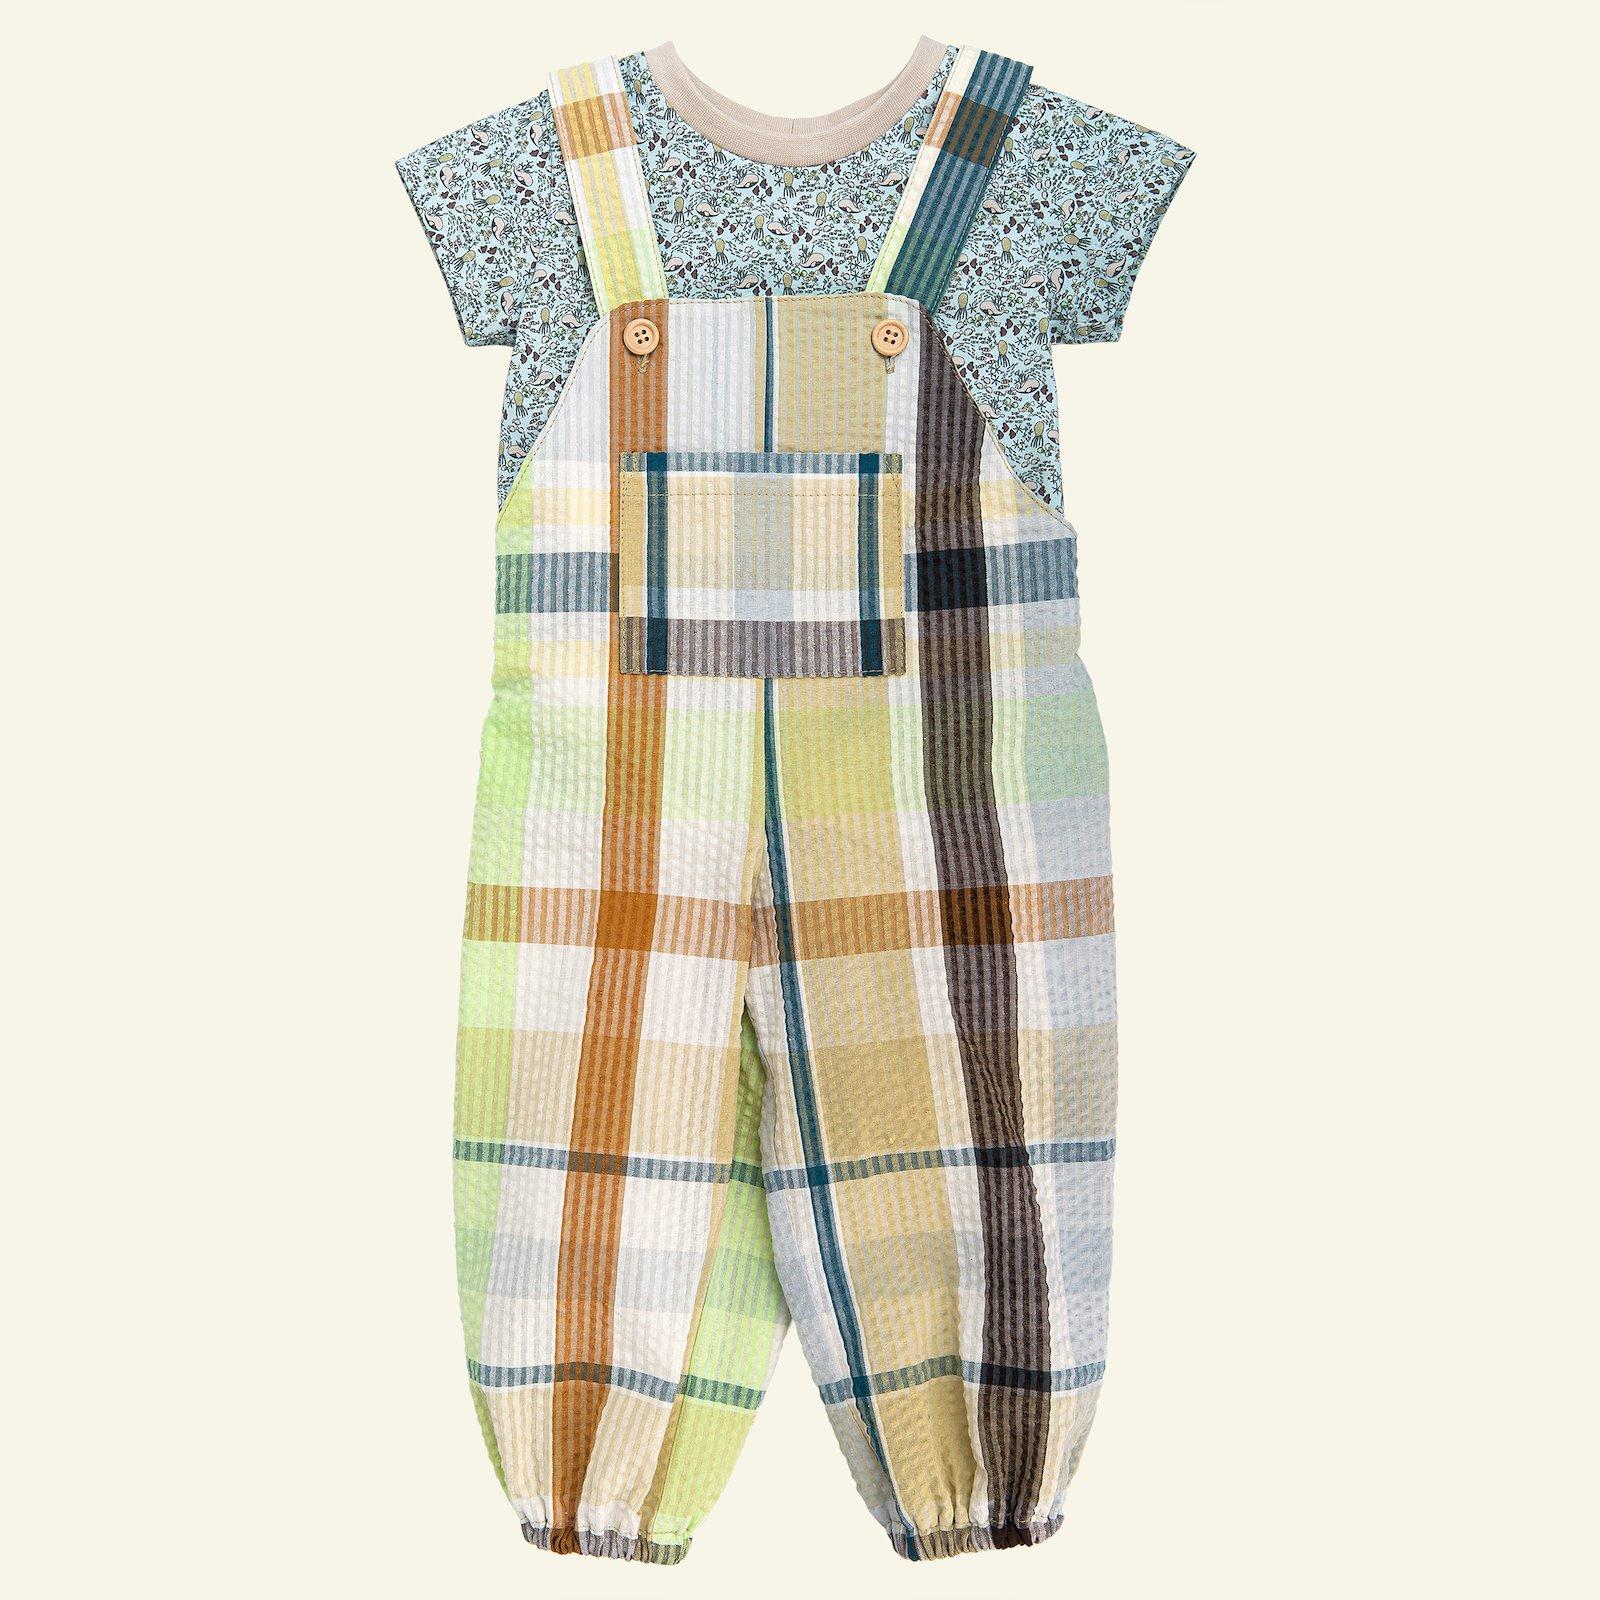 Seersucker blue/green yarn dyed check p80007_580048_33536_p81022_272683_230614_sskit